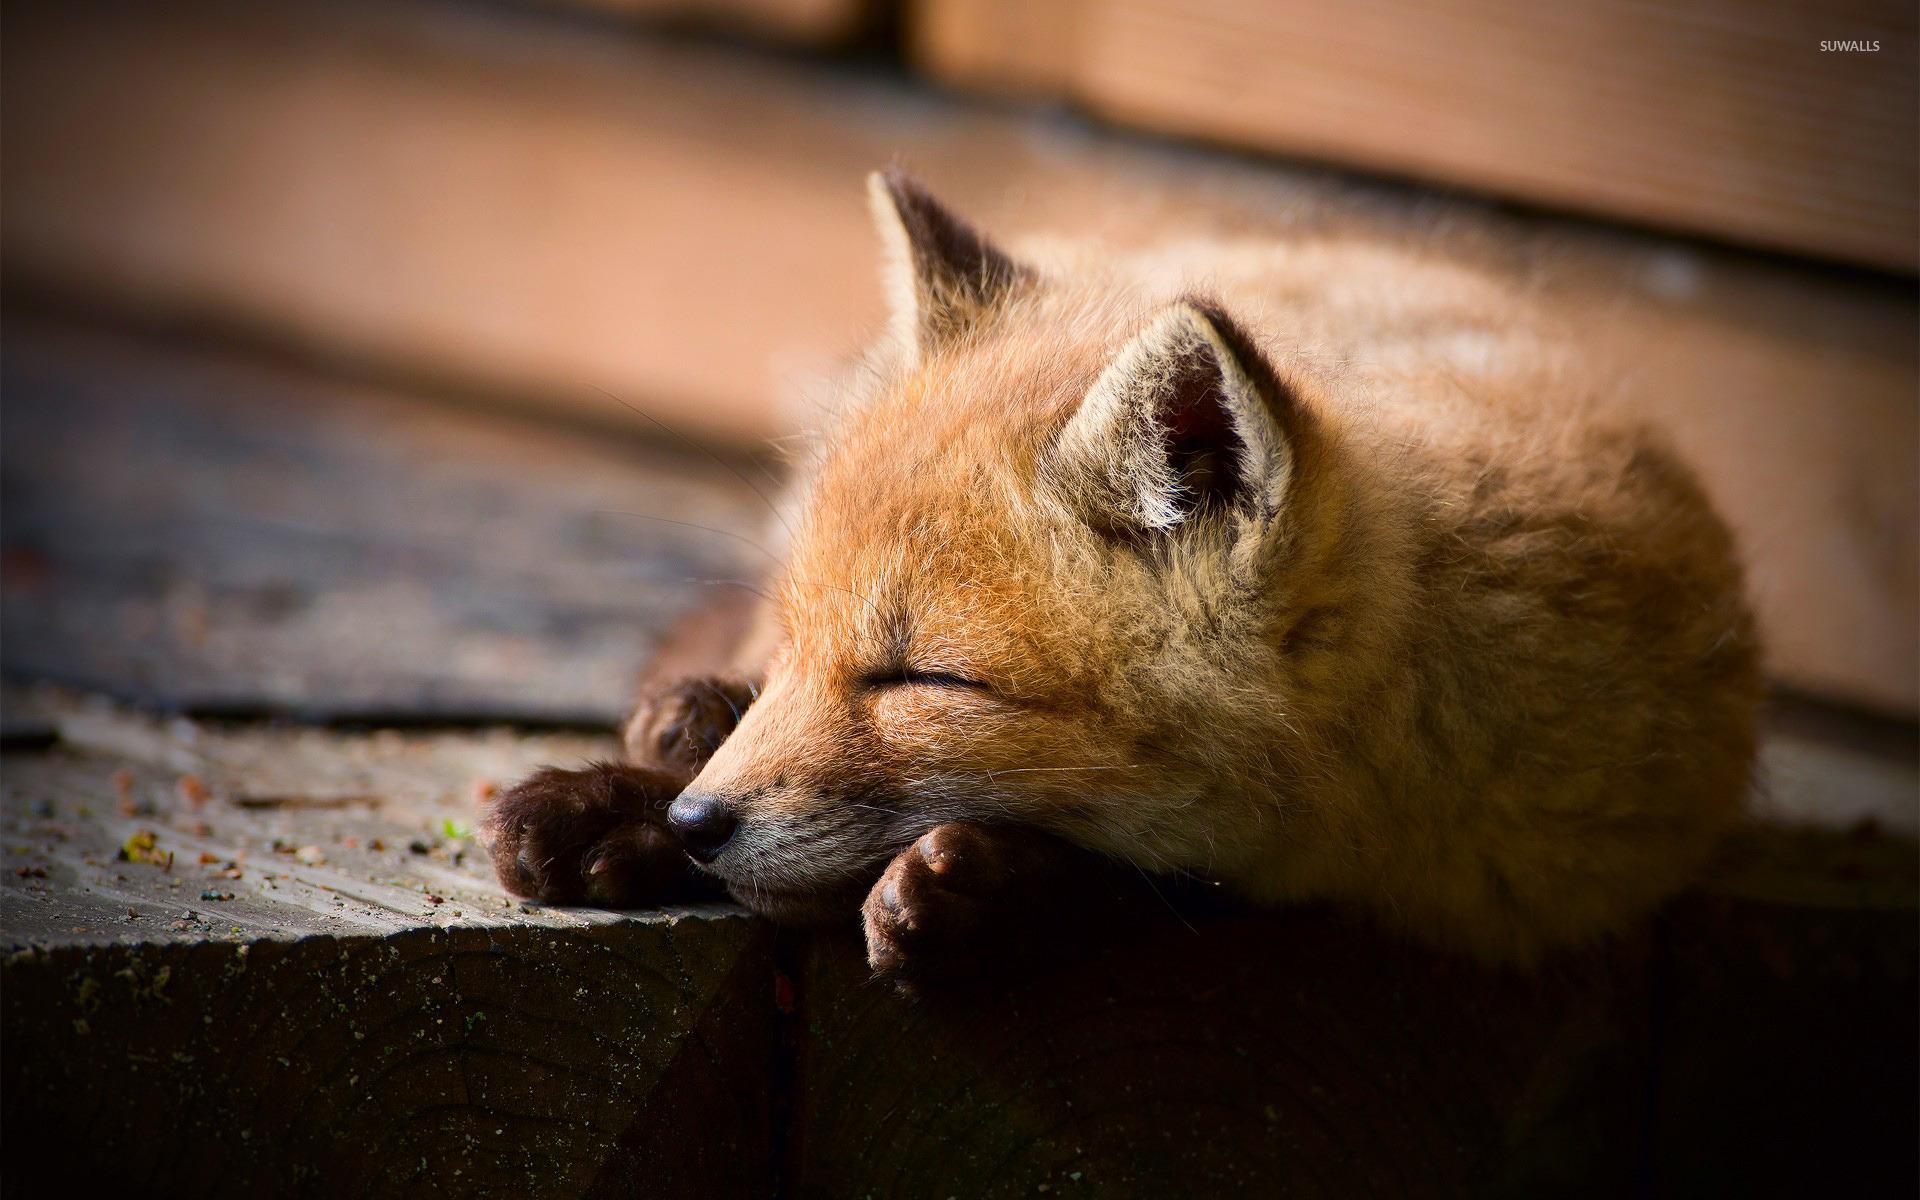 fox sleeping wallpaper - animal wallpapers